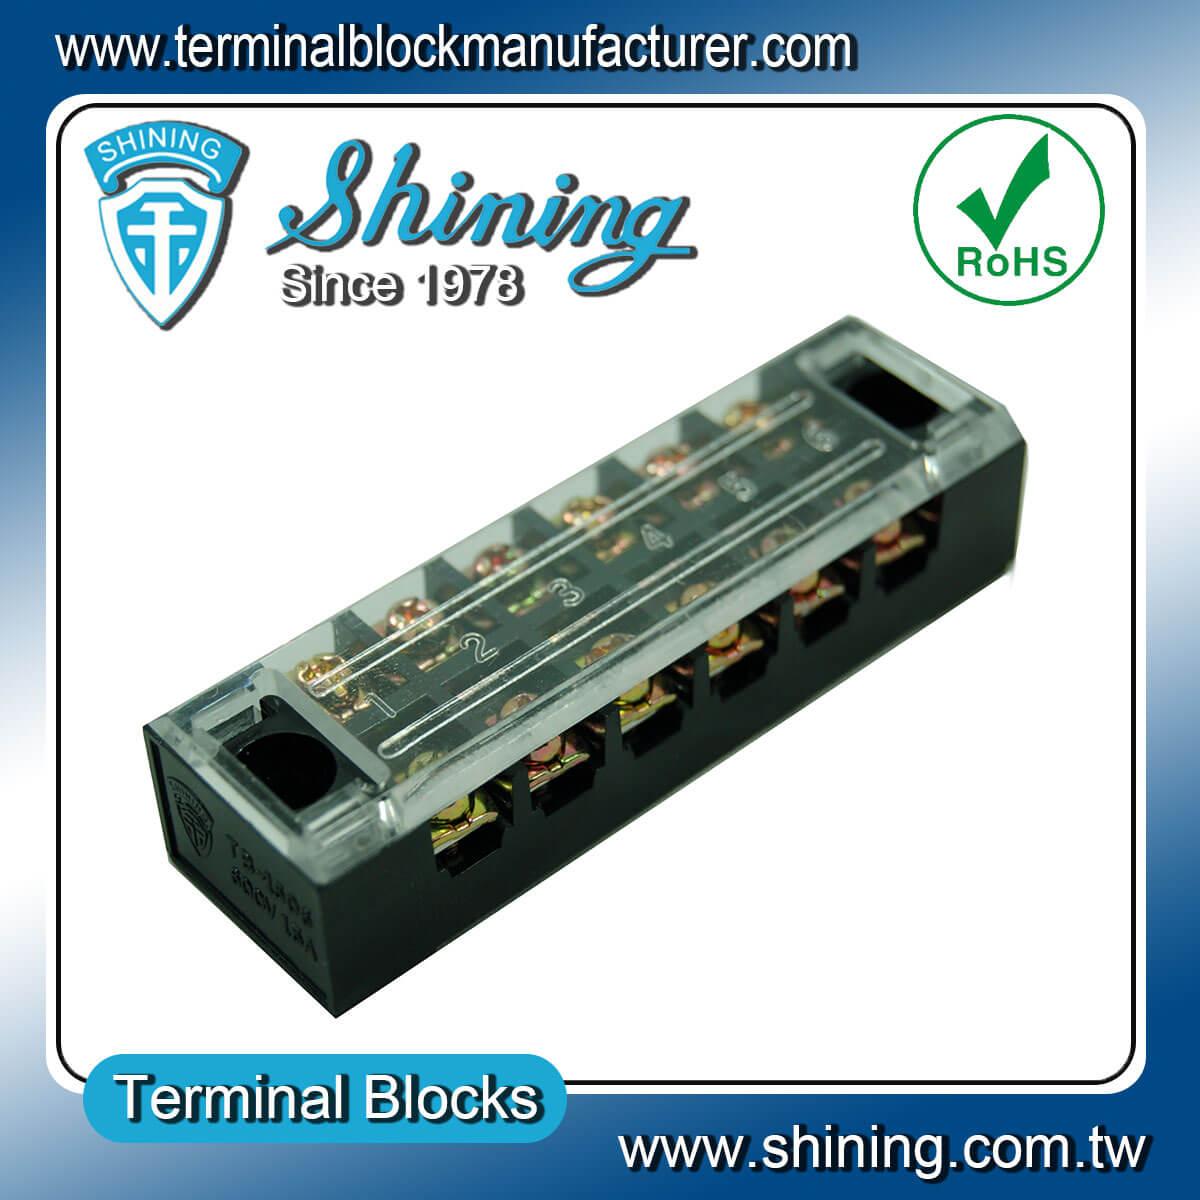 TB-1506 600V 15A 6Pole固定式柵欄端子台